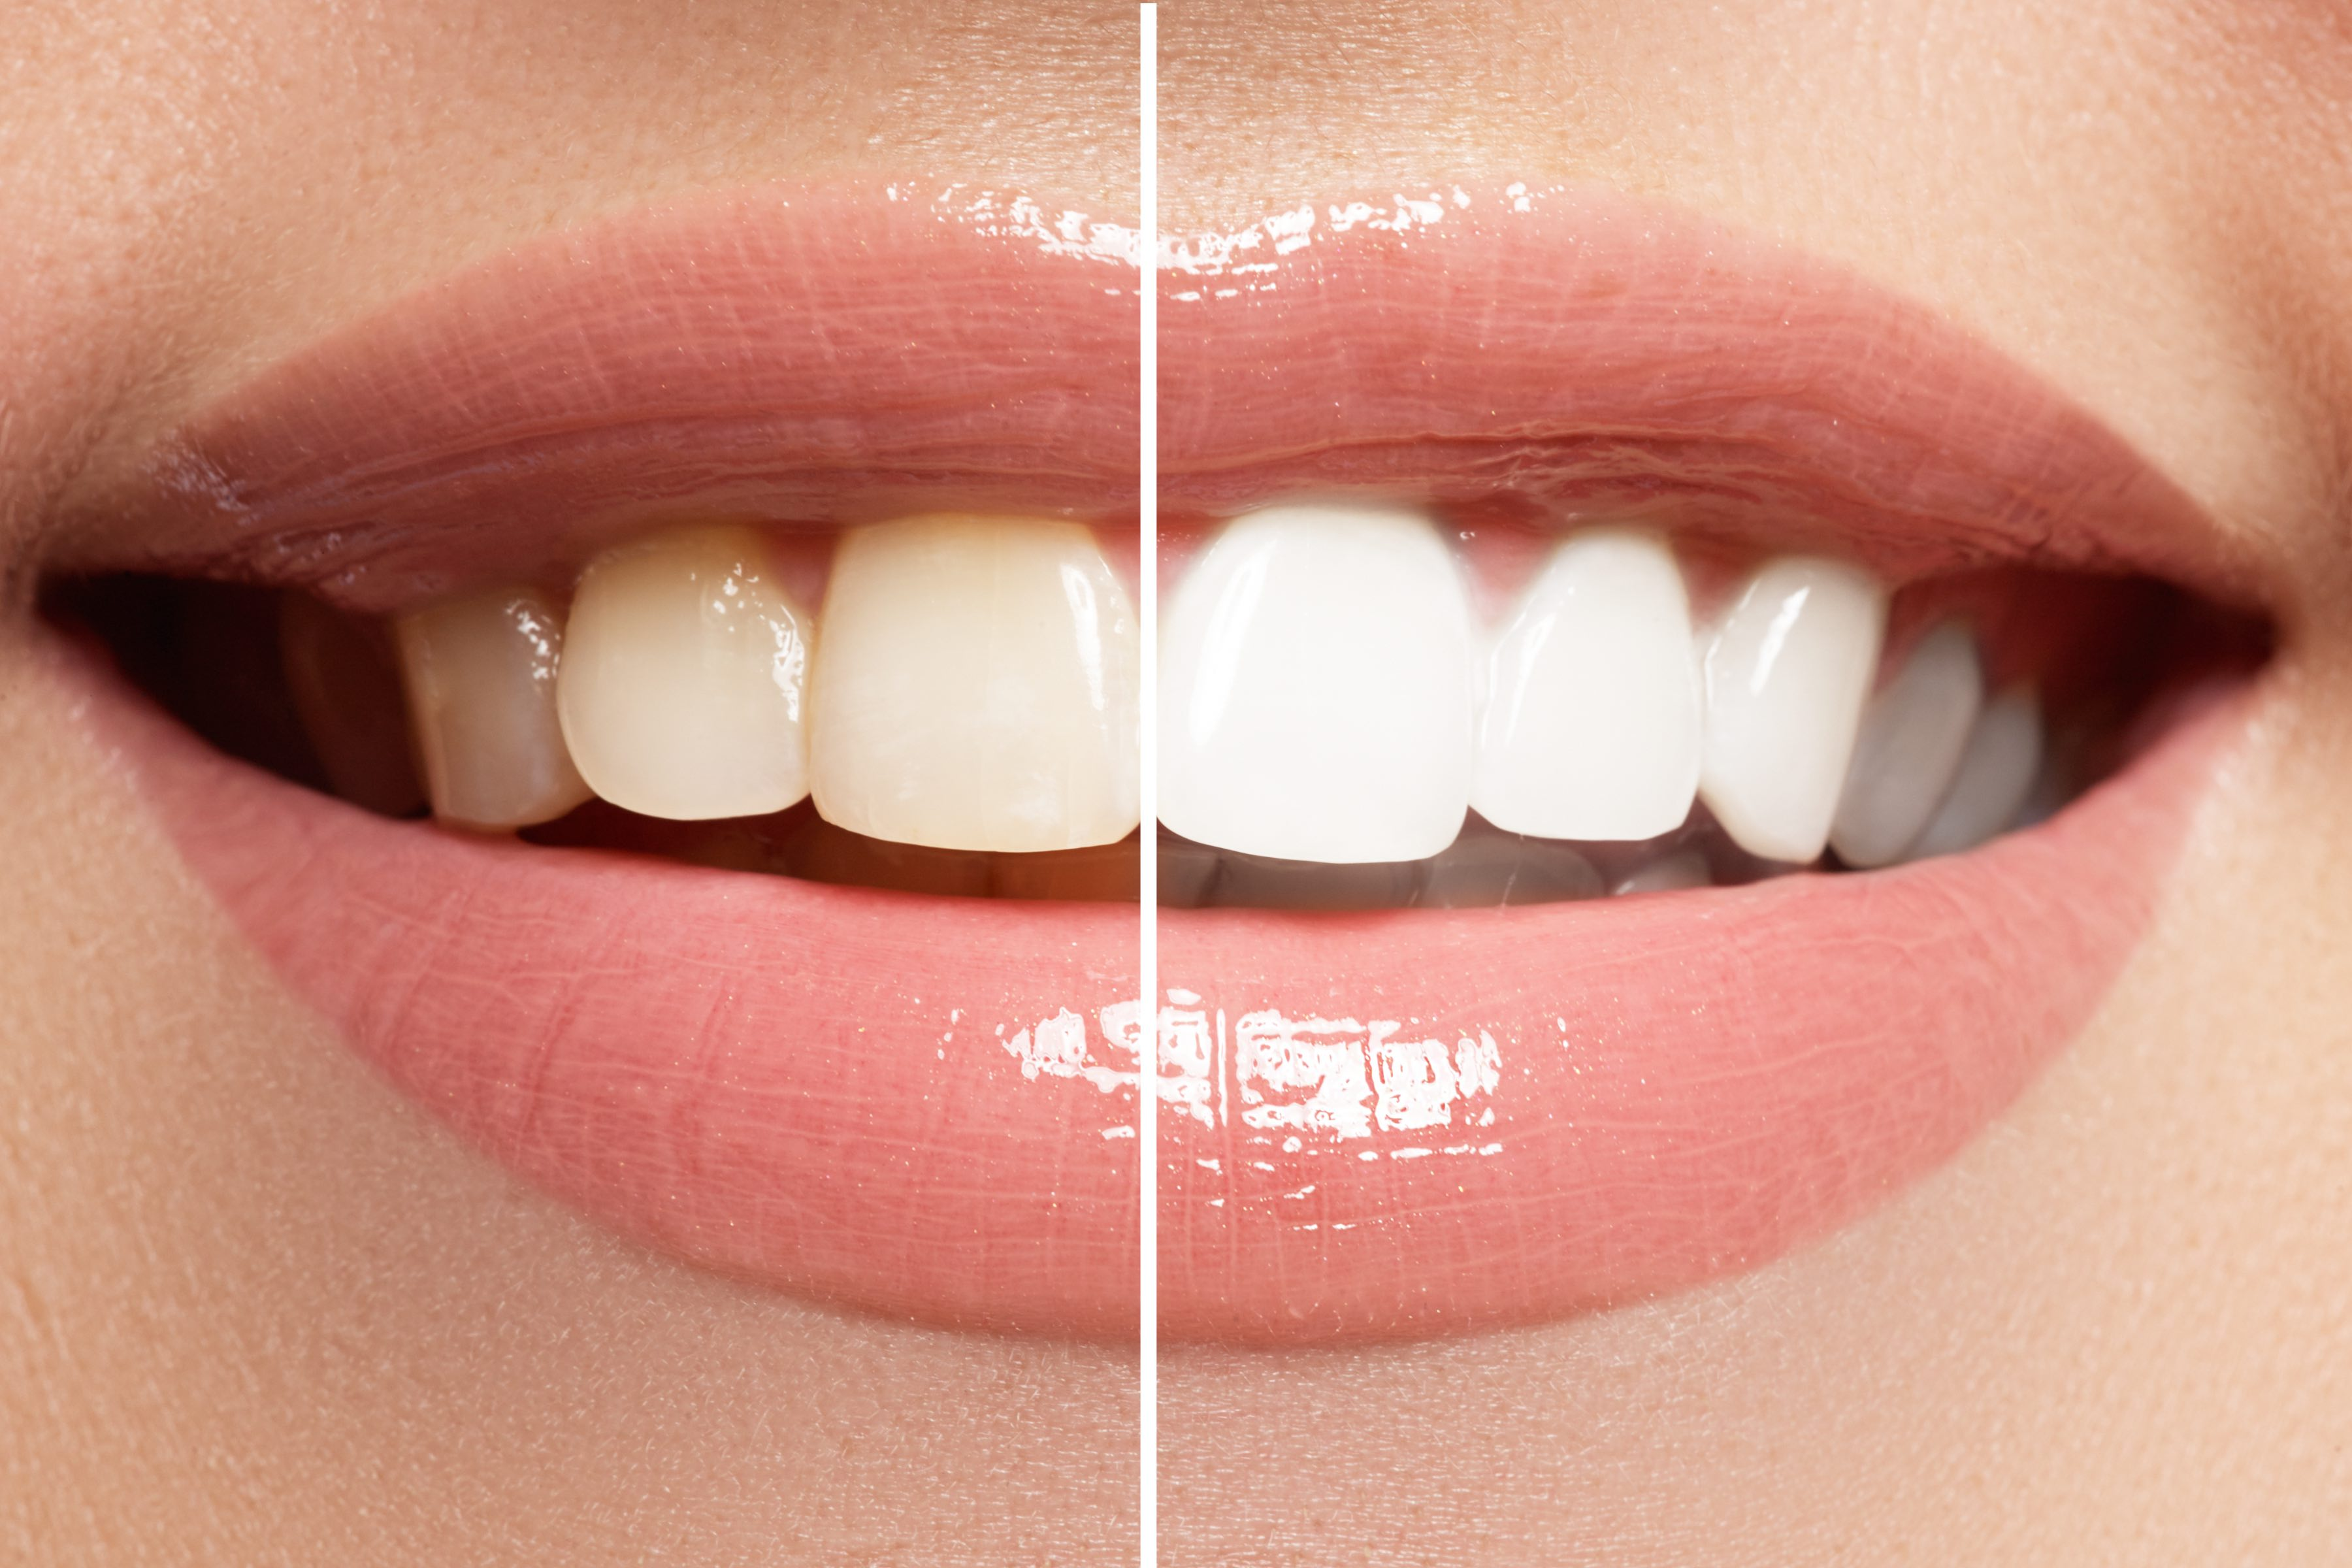 blanchiment-dentaire_608bd88b5d6ea.jpg